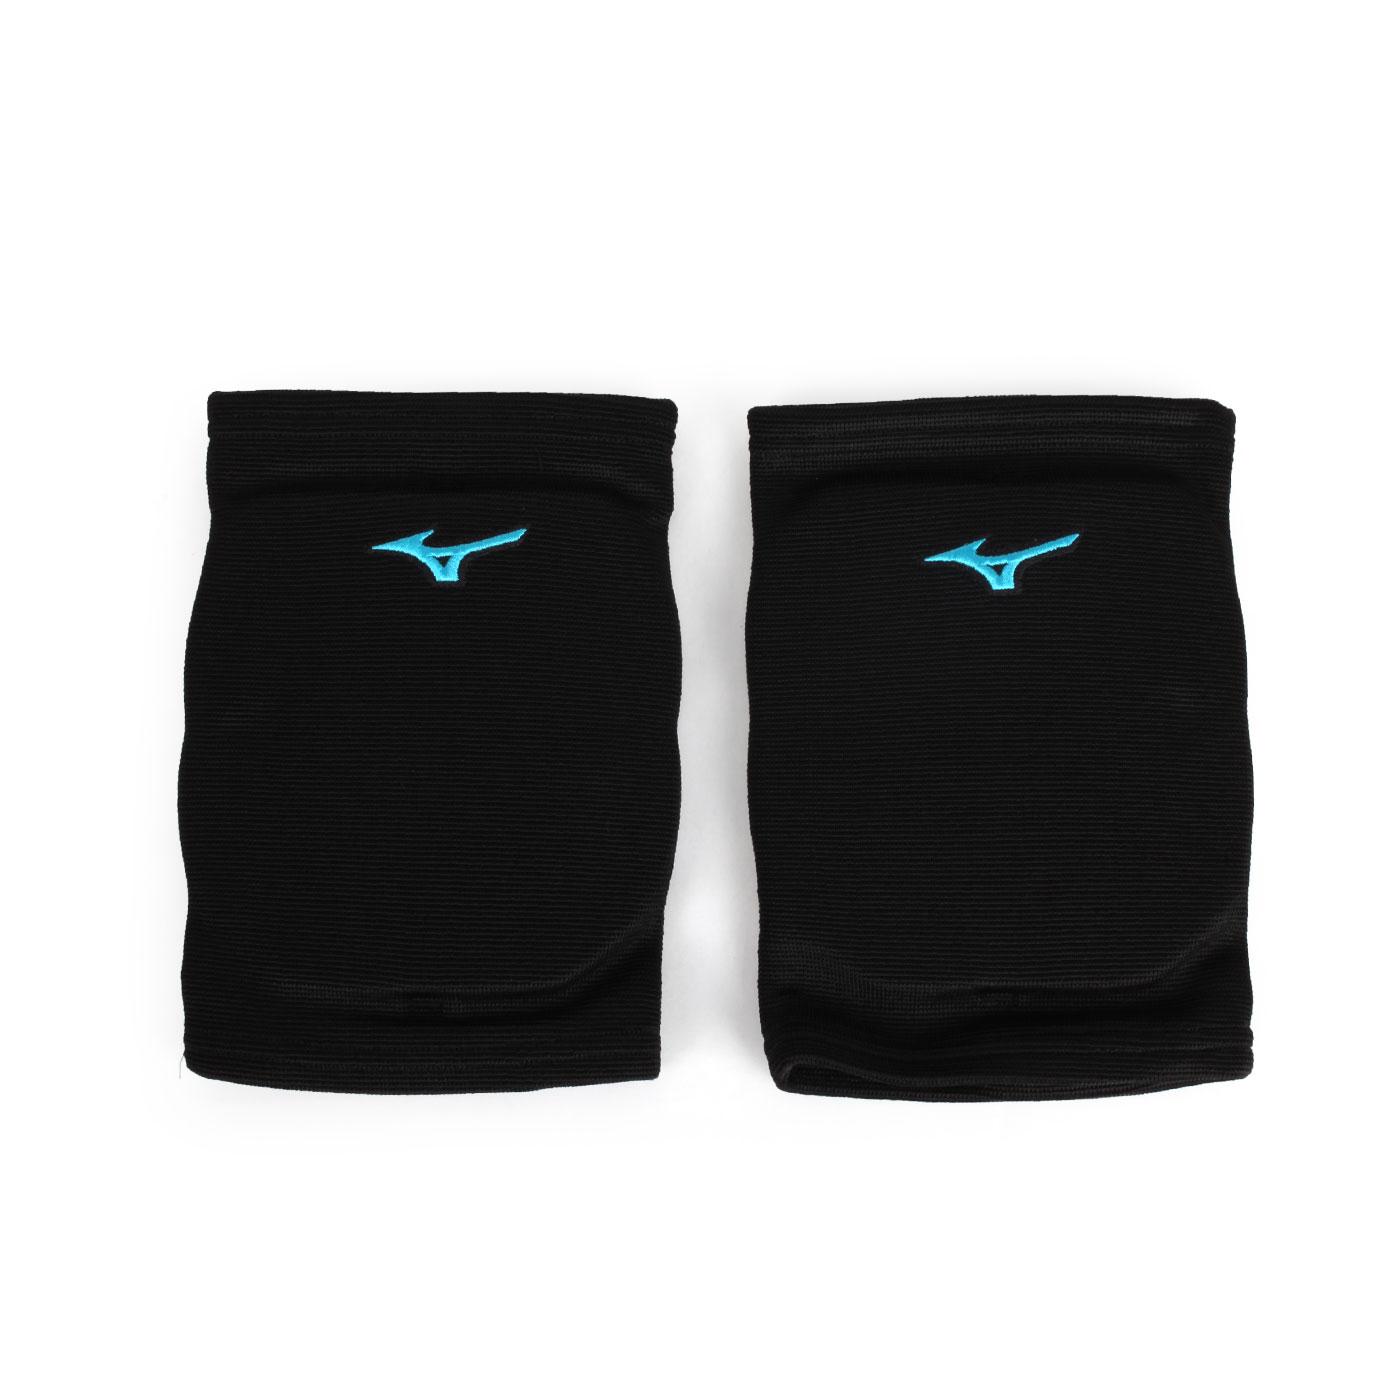 MIZUNO 成人用護膝 V2TY800609 - 黑水藍